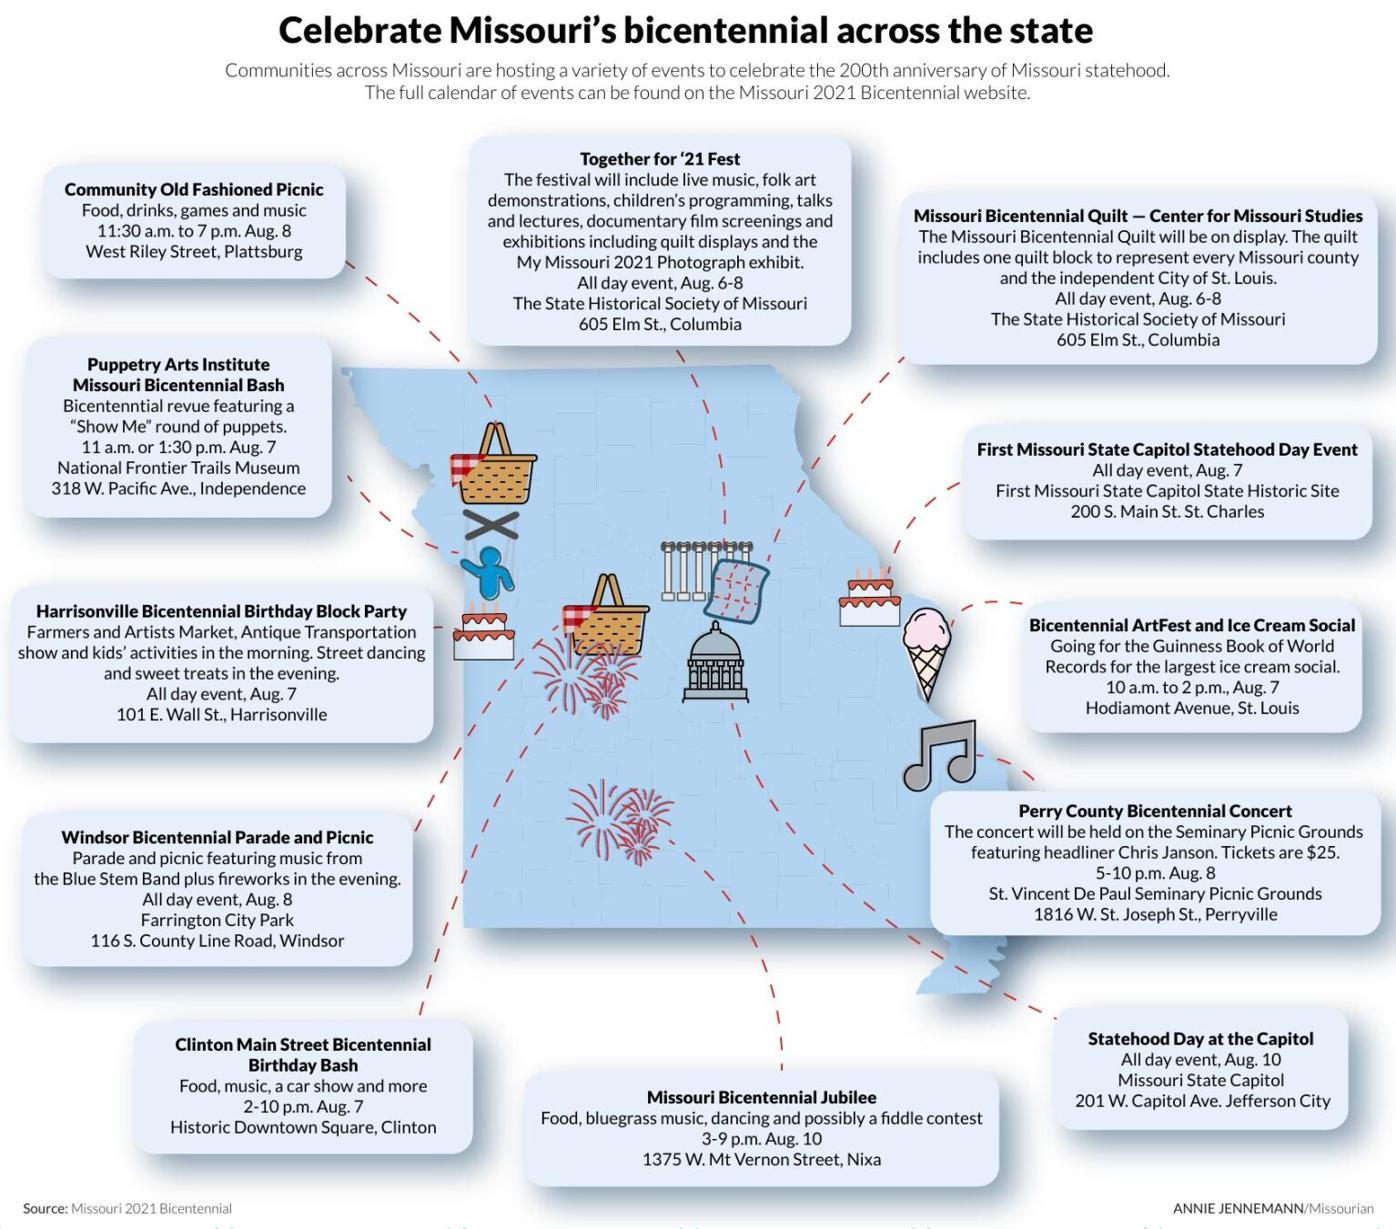 Celebrate Missouri's bicentennial across the state